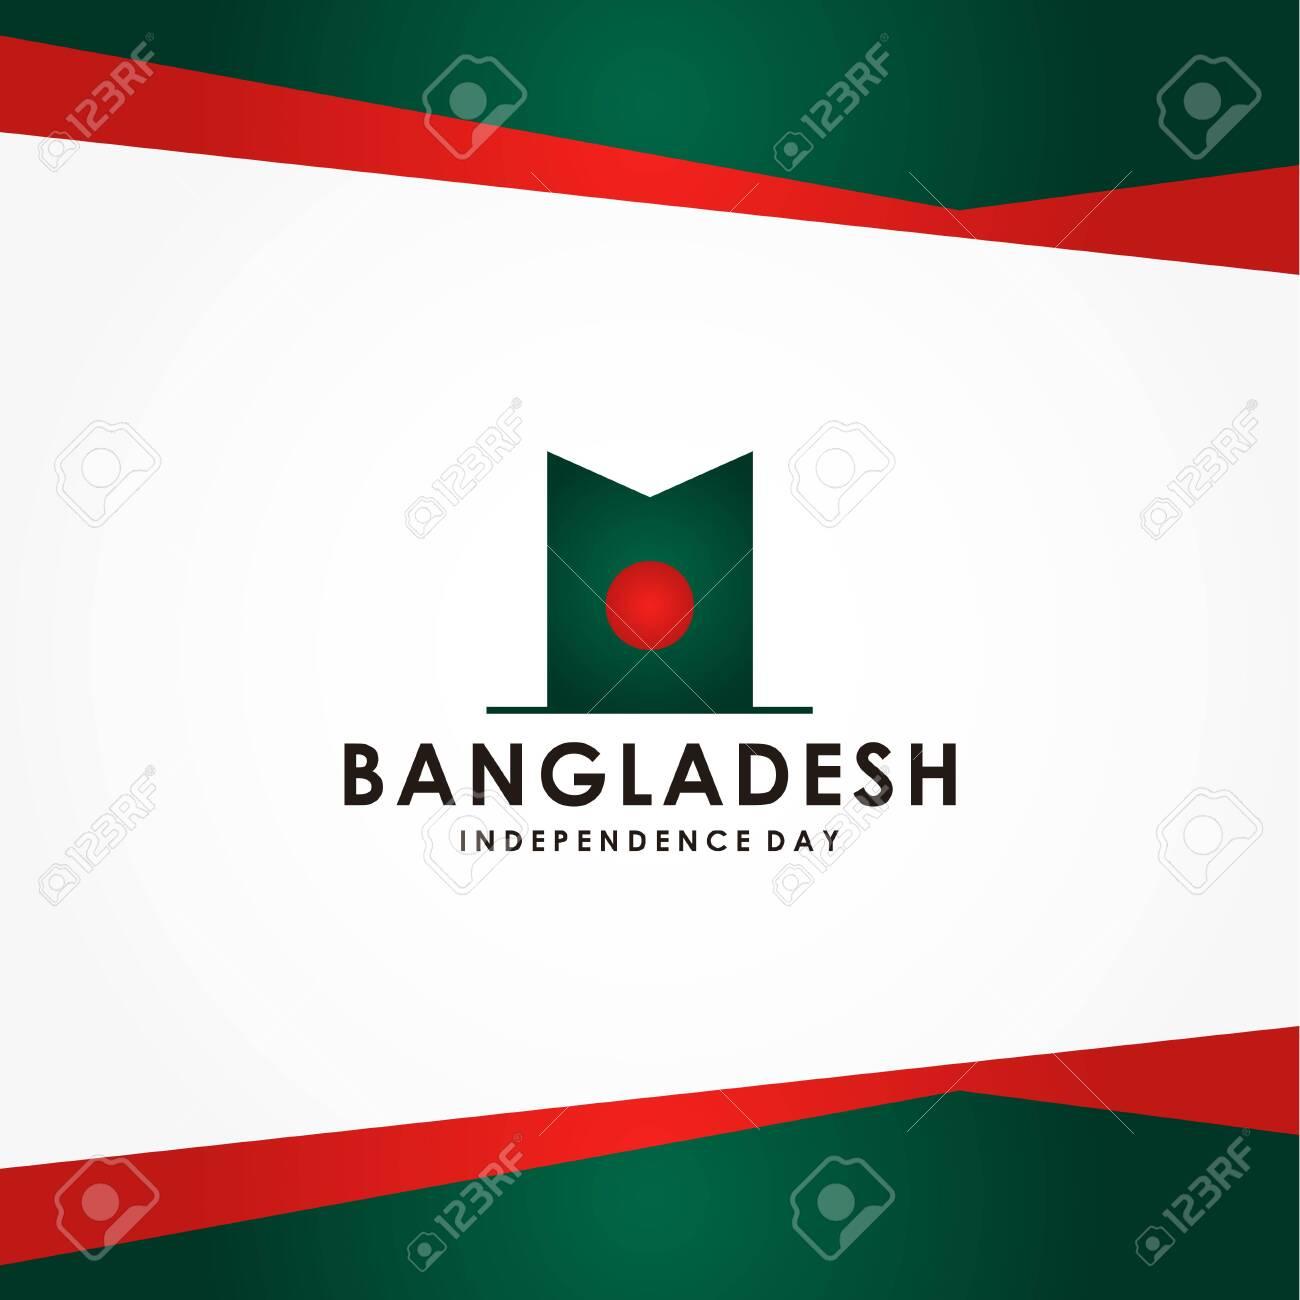 Bangladesh Independence Day Vector Design For Banner or Background - 139900167